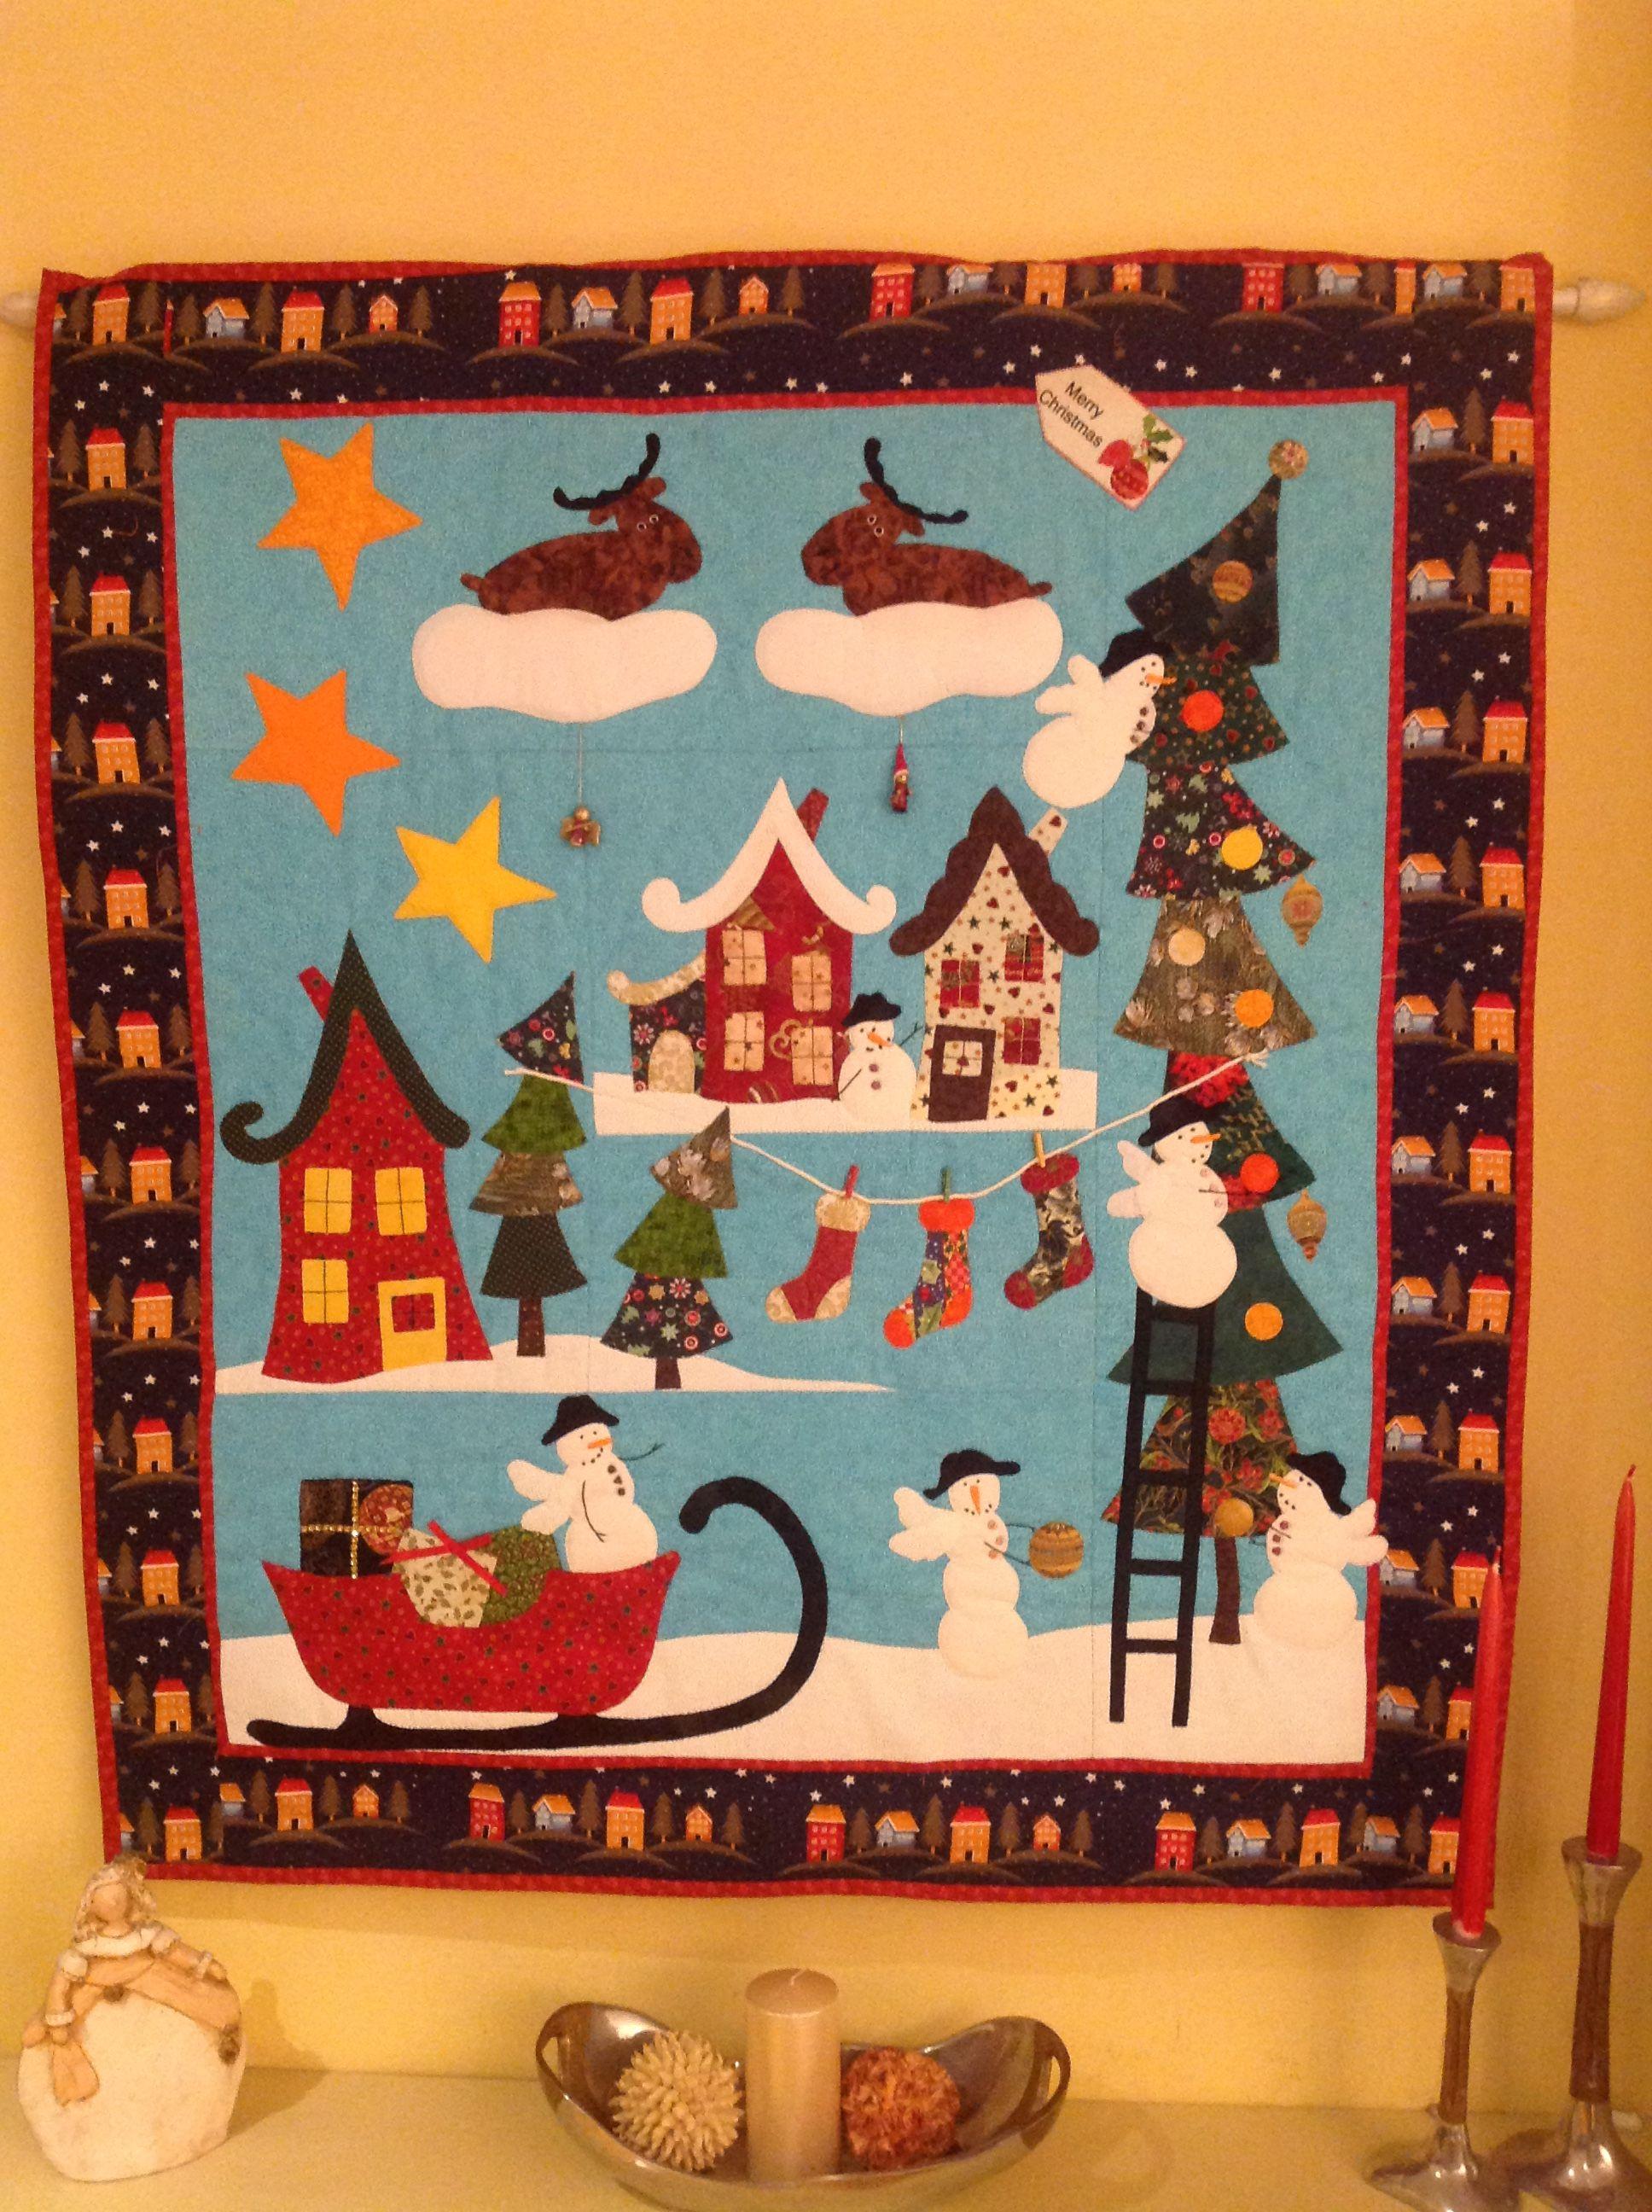 Mural de navidad patchwork pinterest murales de - Murales decorativos de navidad ...